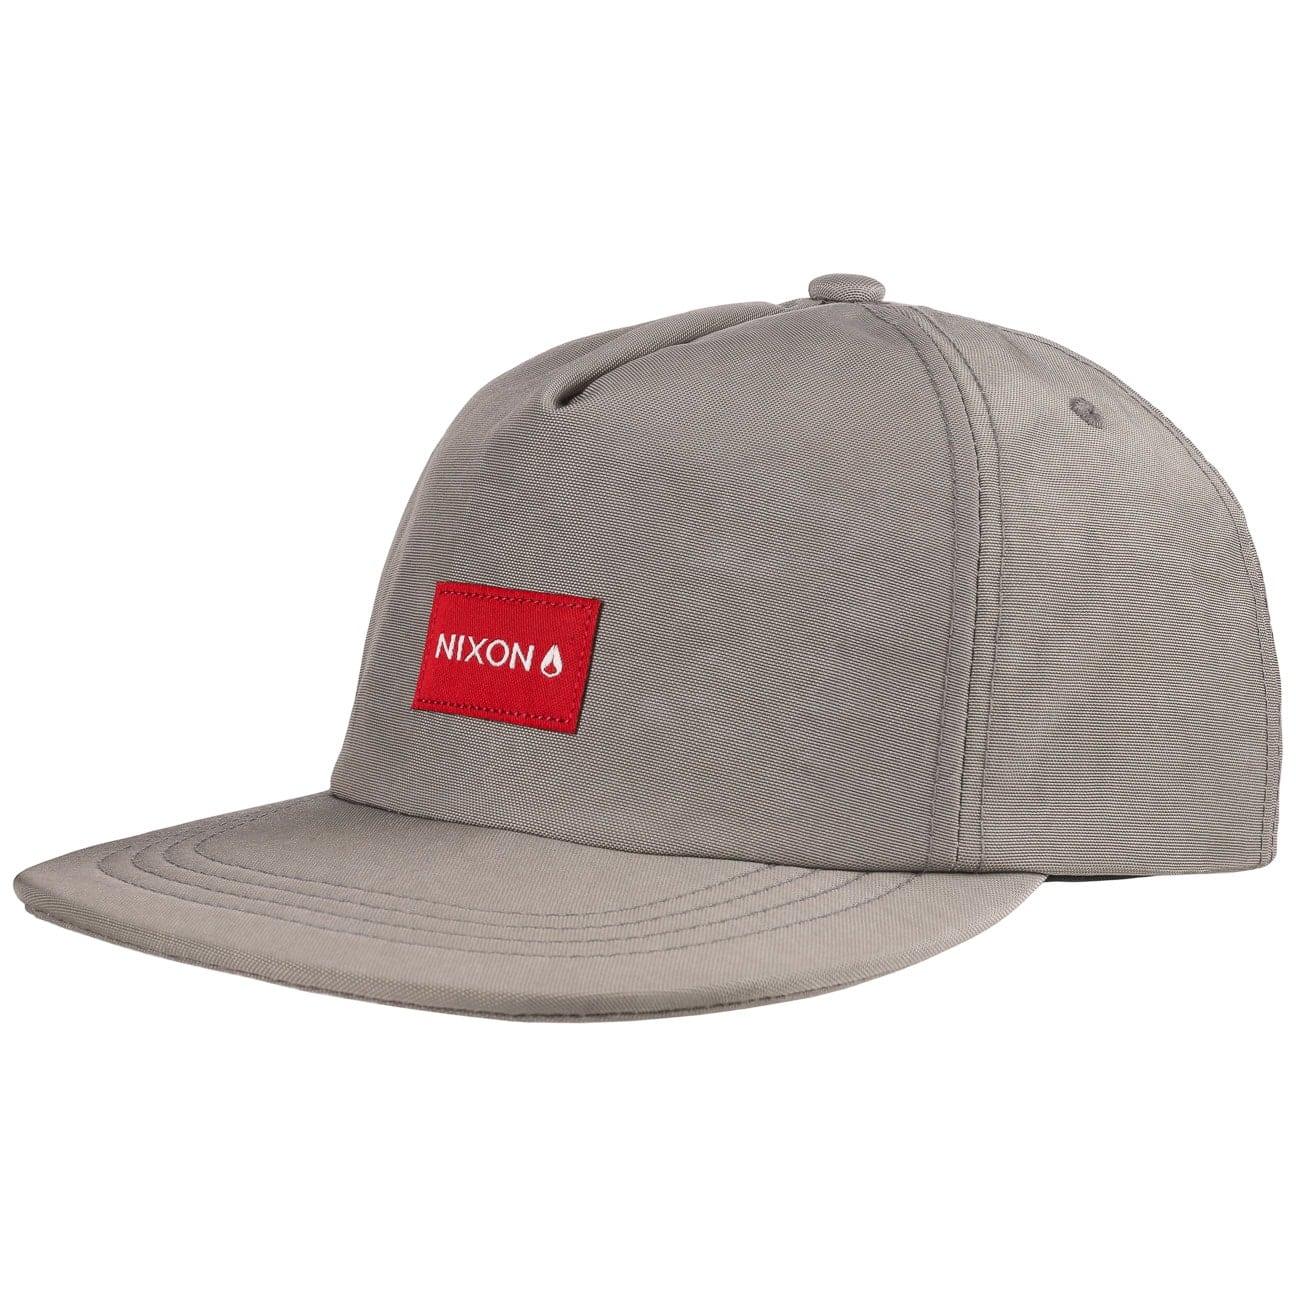 Gorra Moonlight Strapback by Nixon  strapback cap